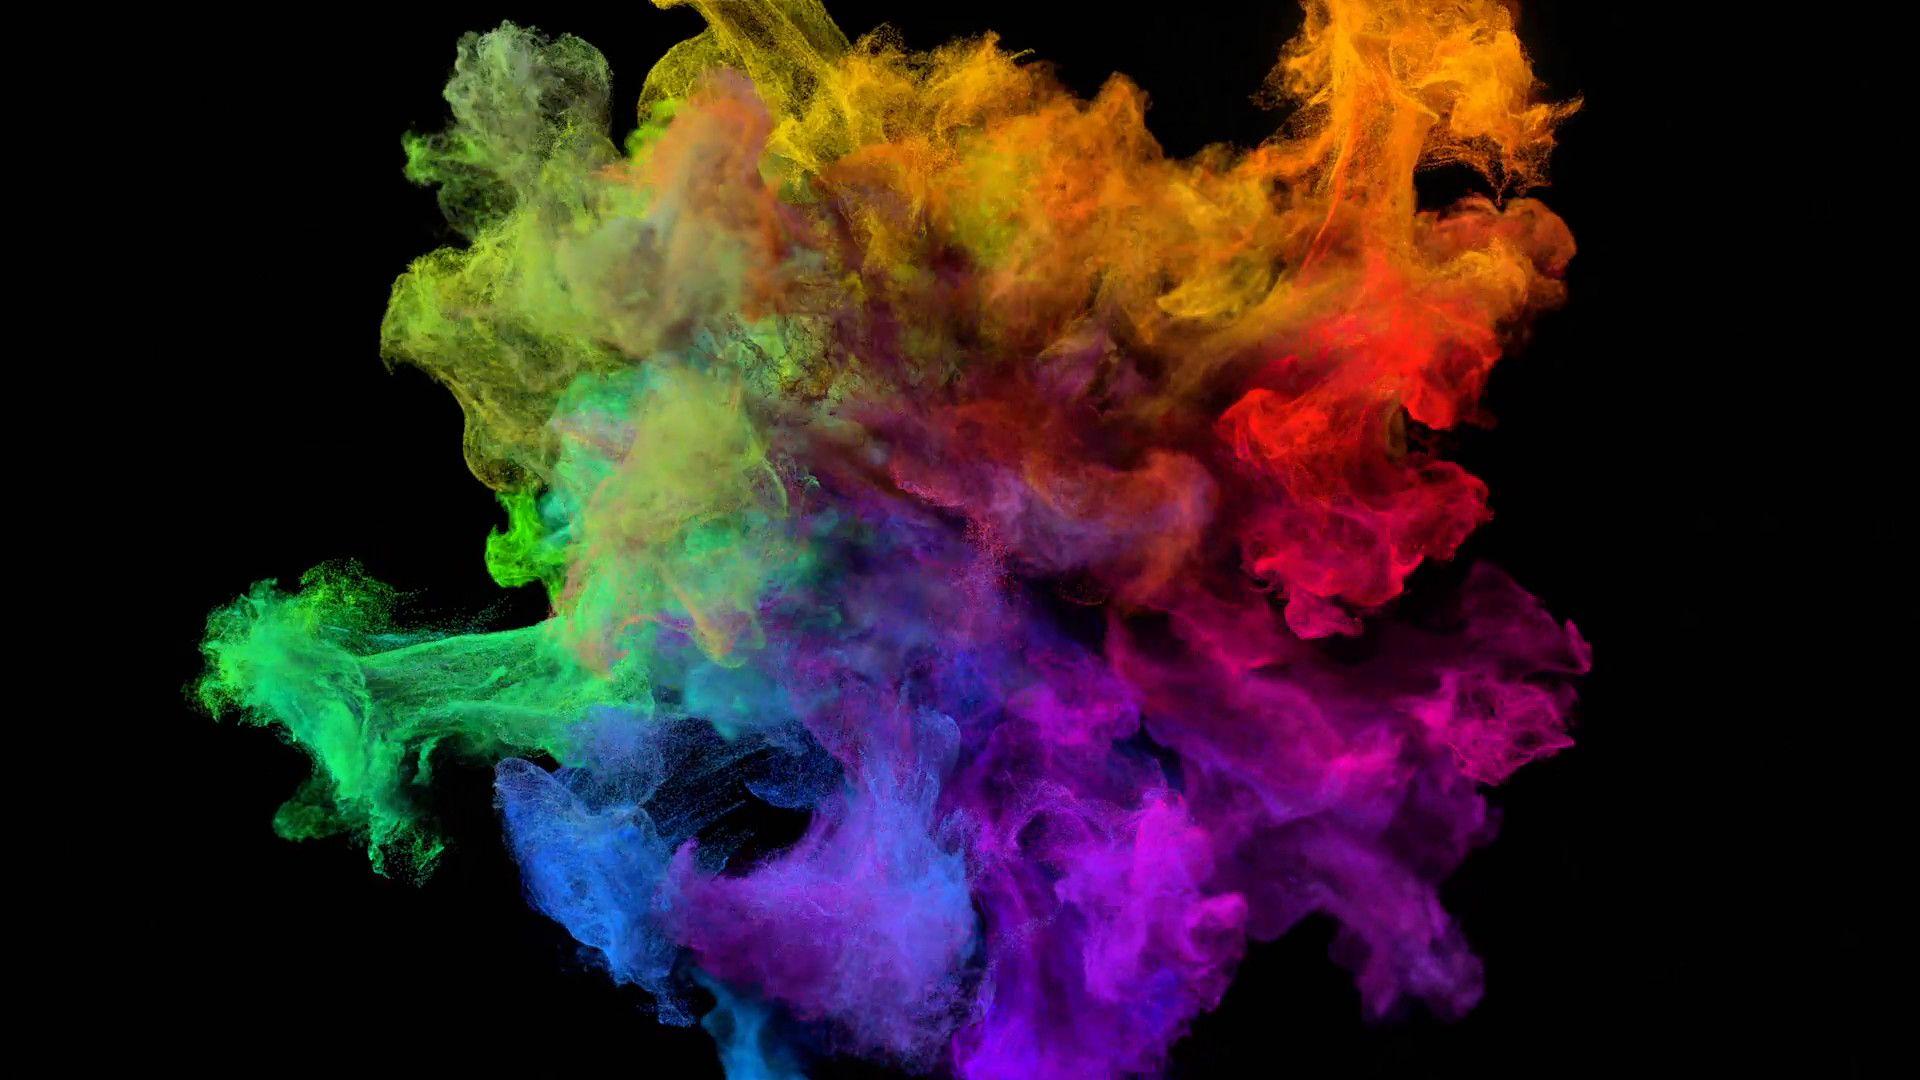 1920x1080 Color Explosion On Black Spectrum With Alpha Matte